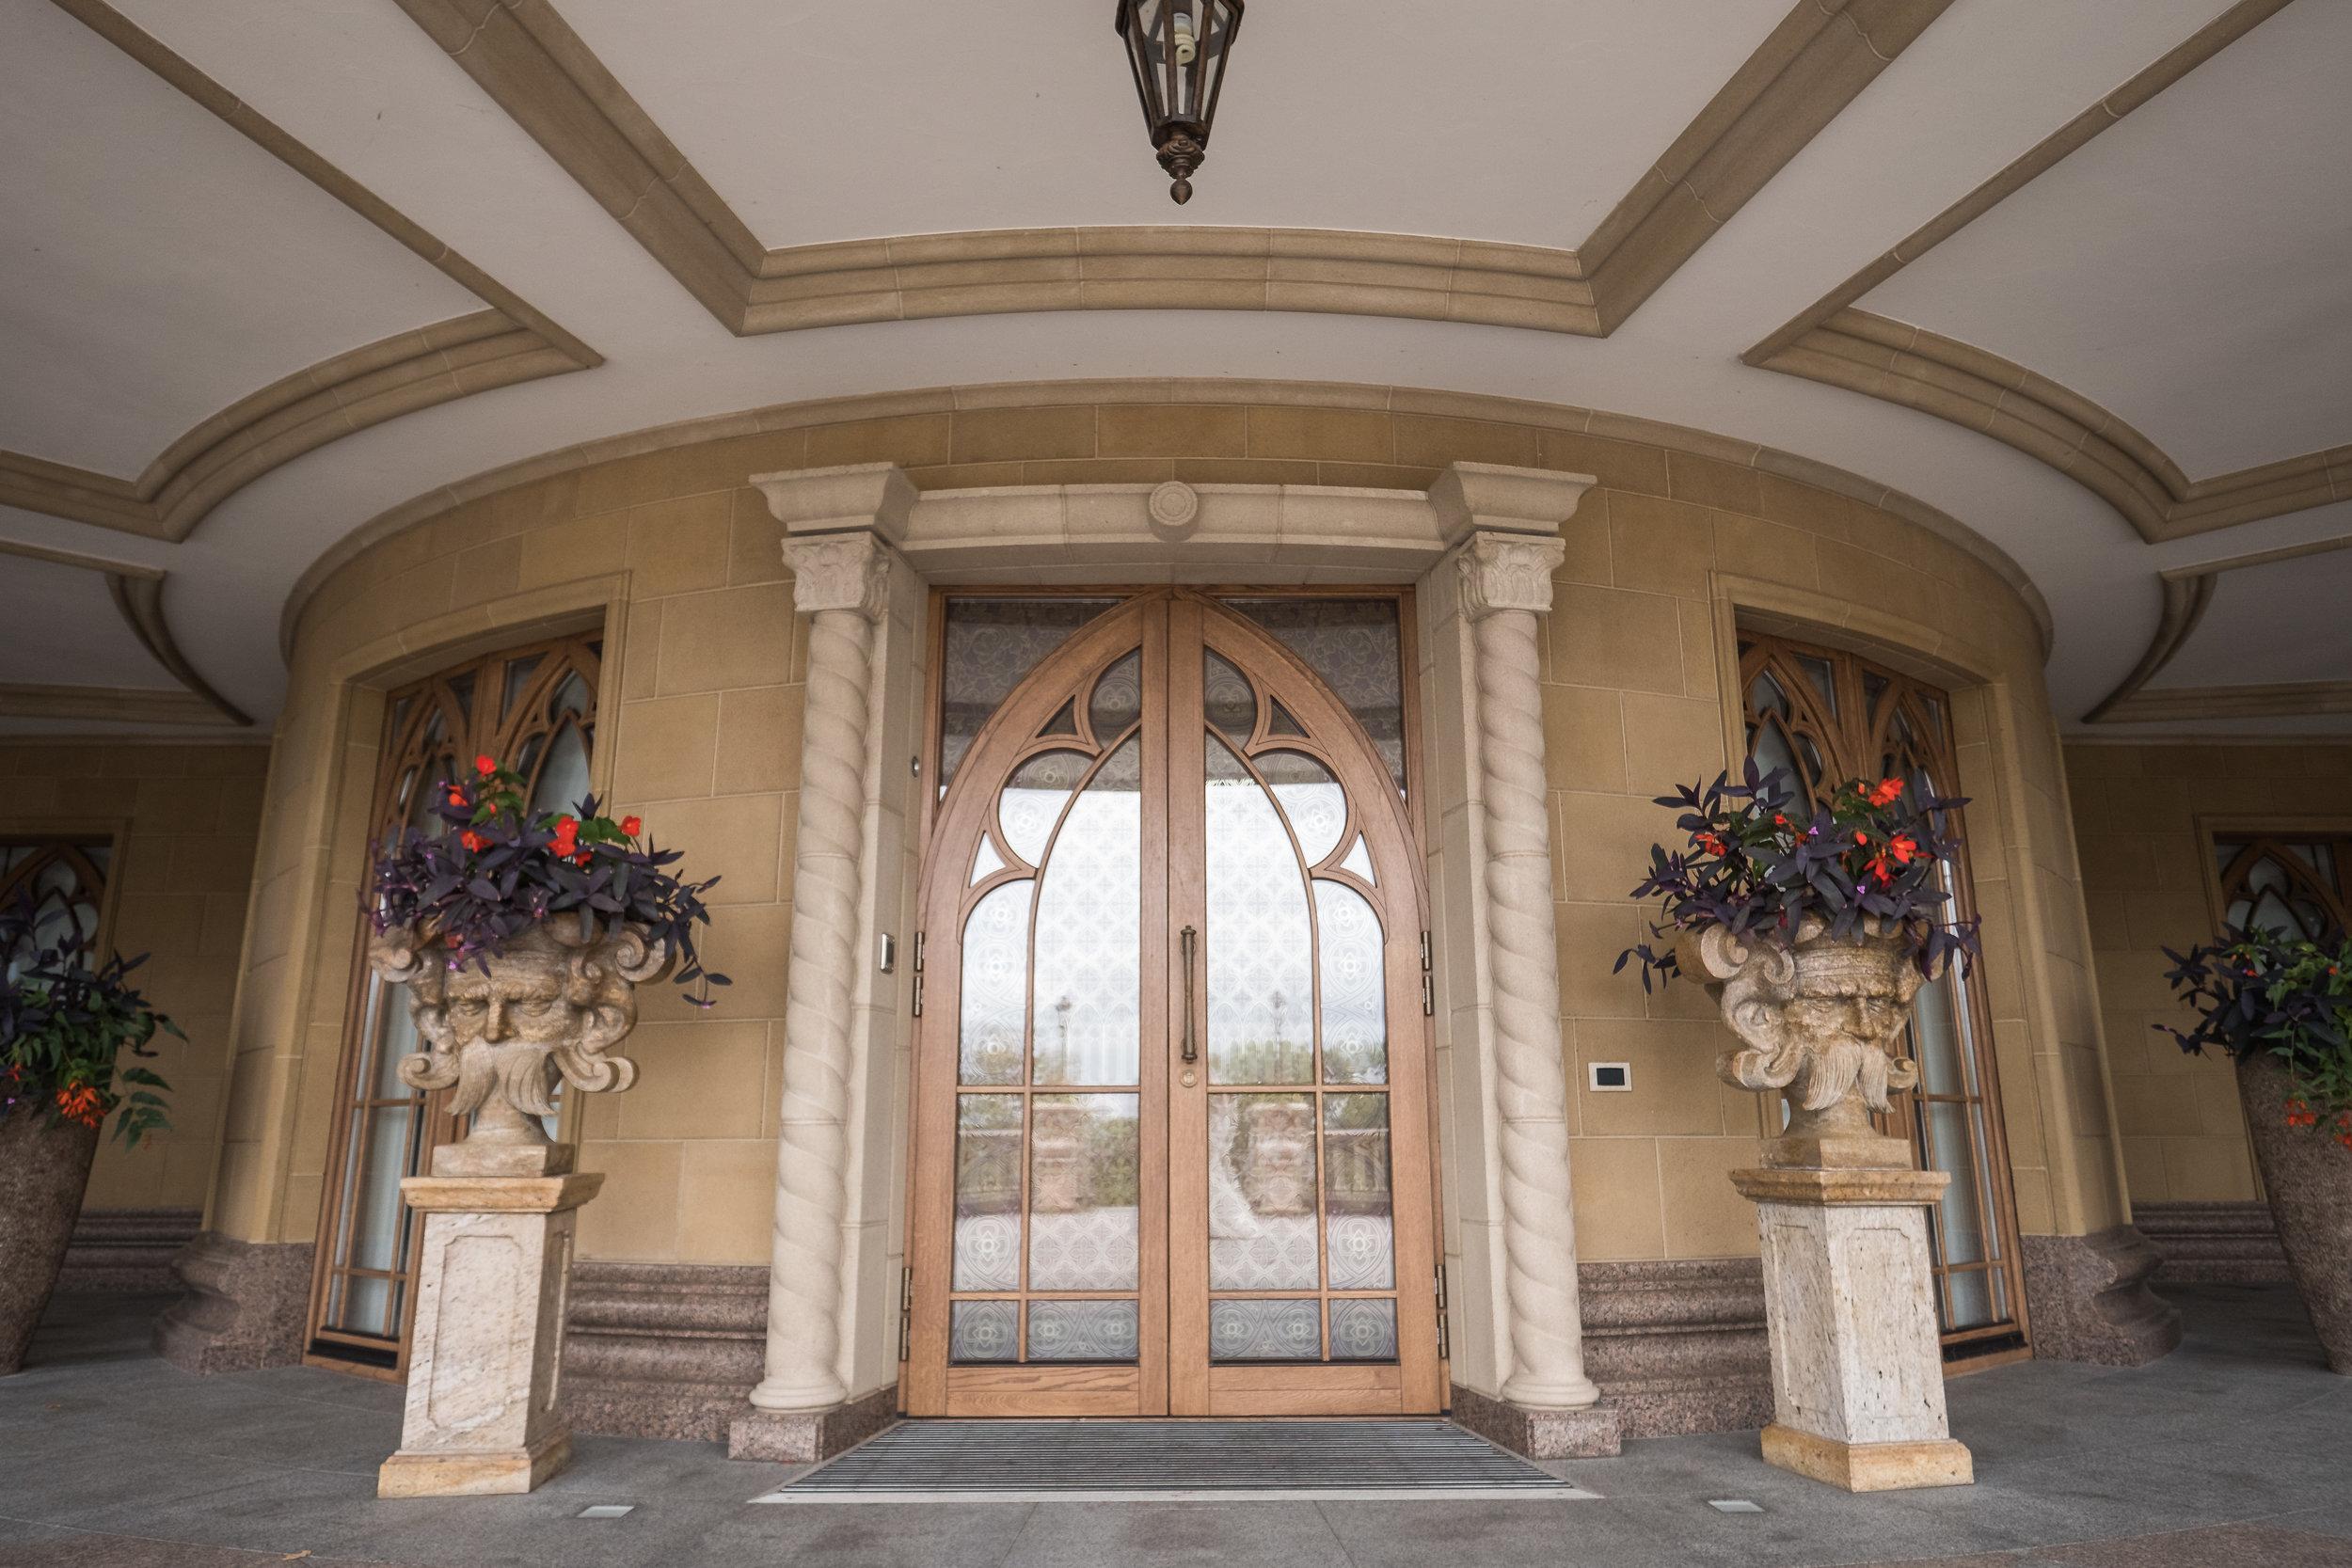 detail of balcony's fine craftsmanship